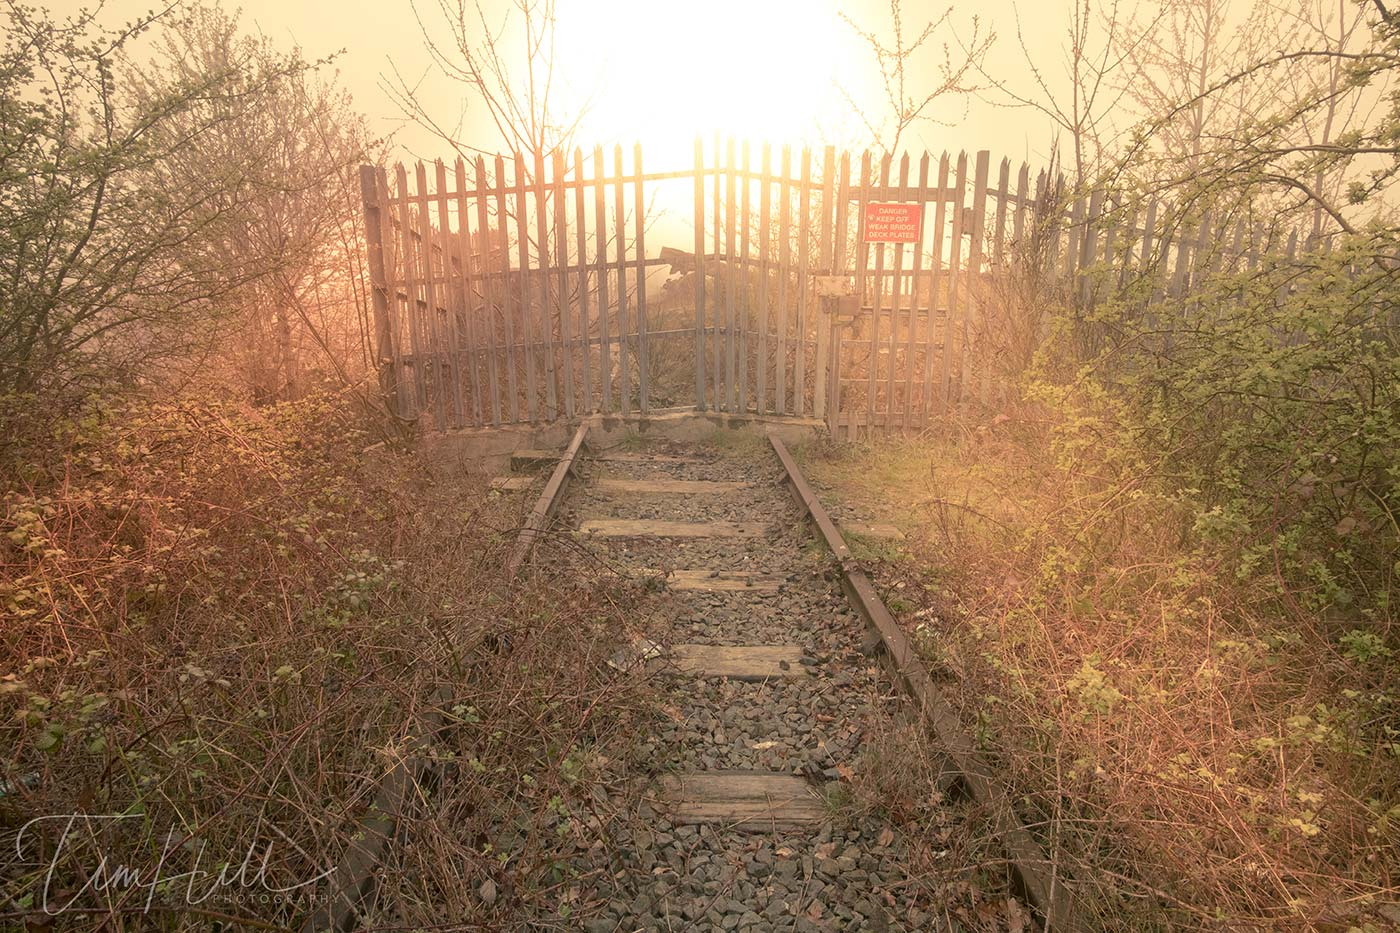 Lock Lane Castleford and the Suicide Bridge